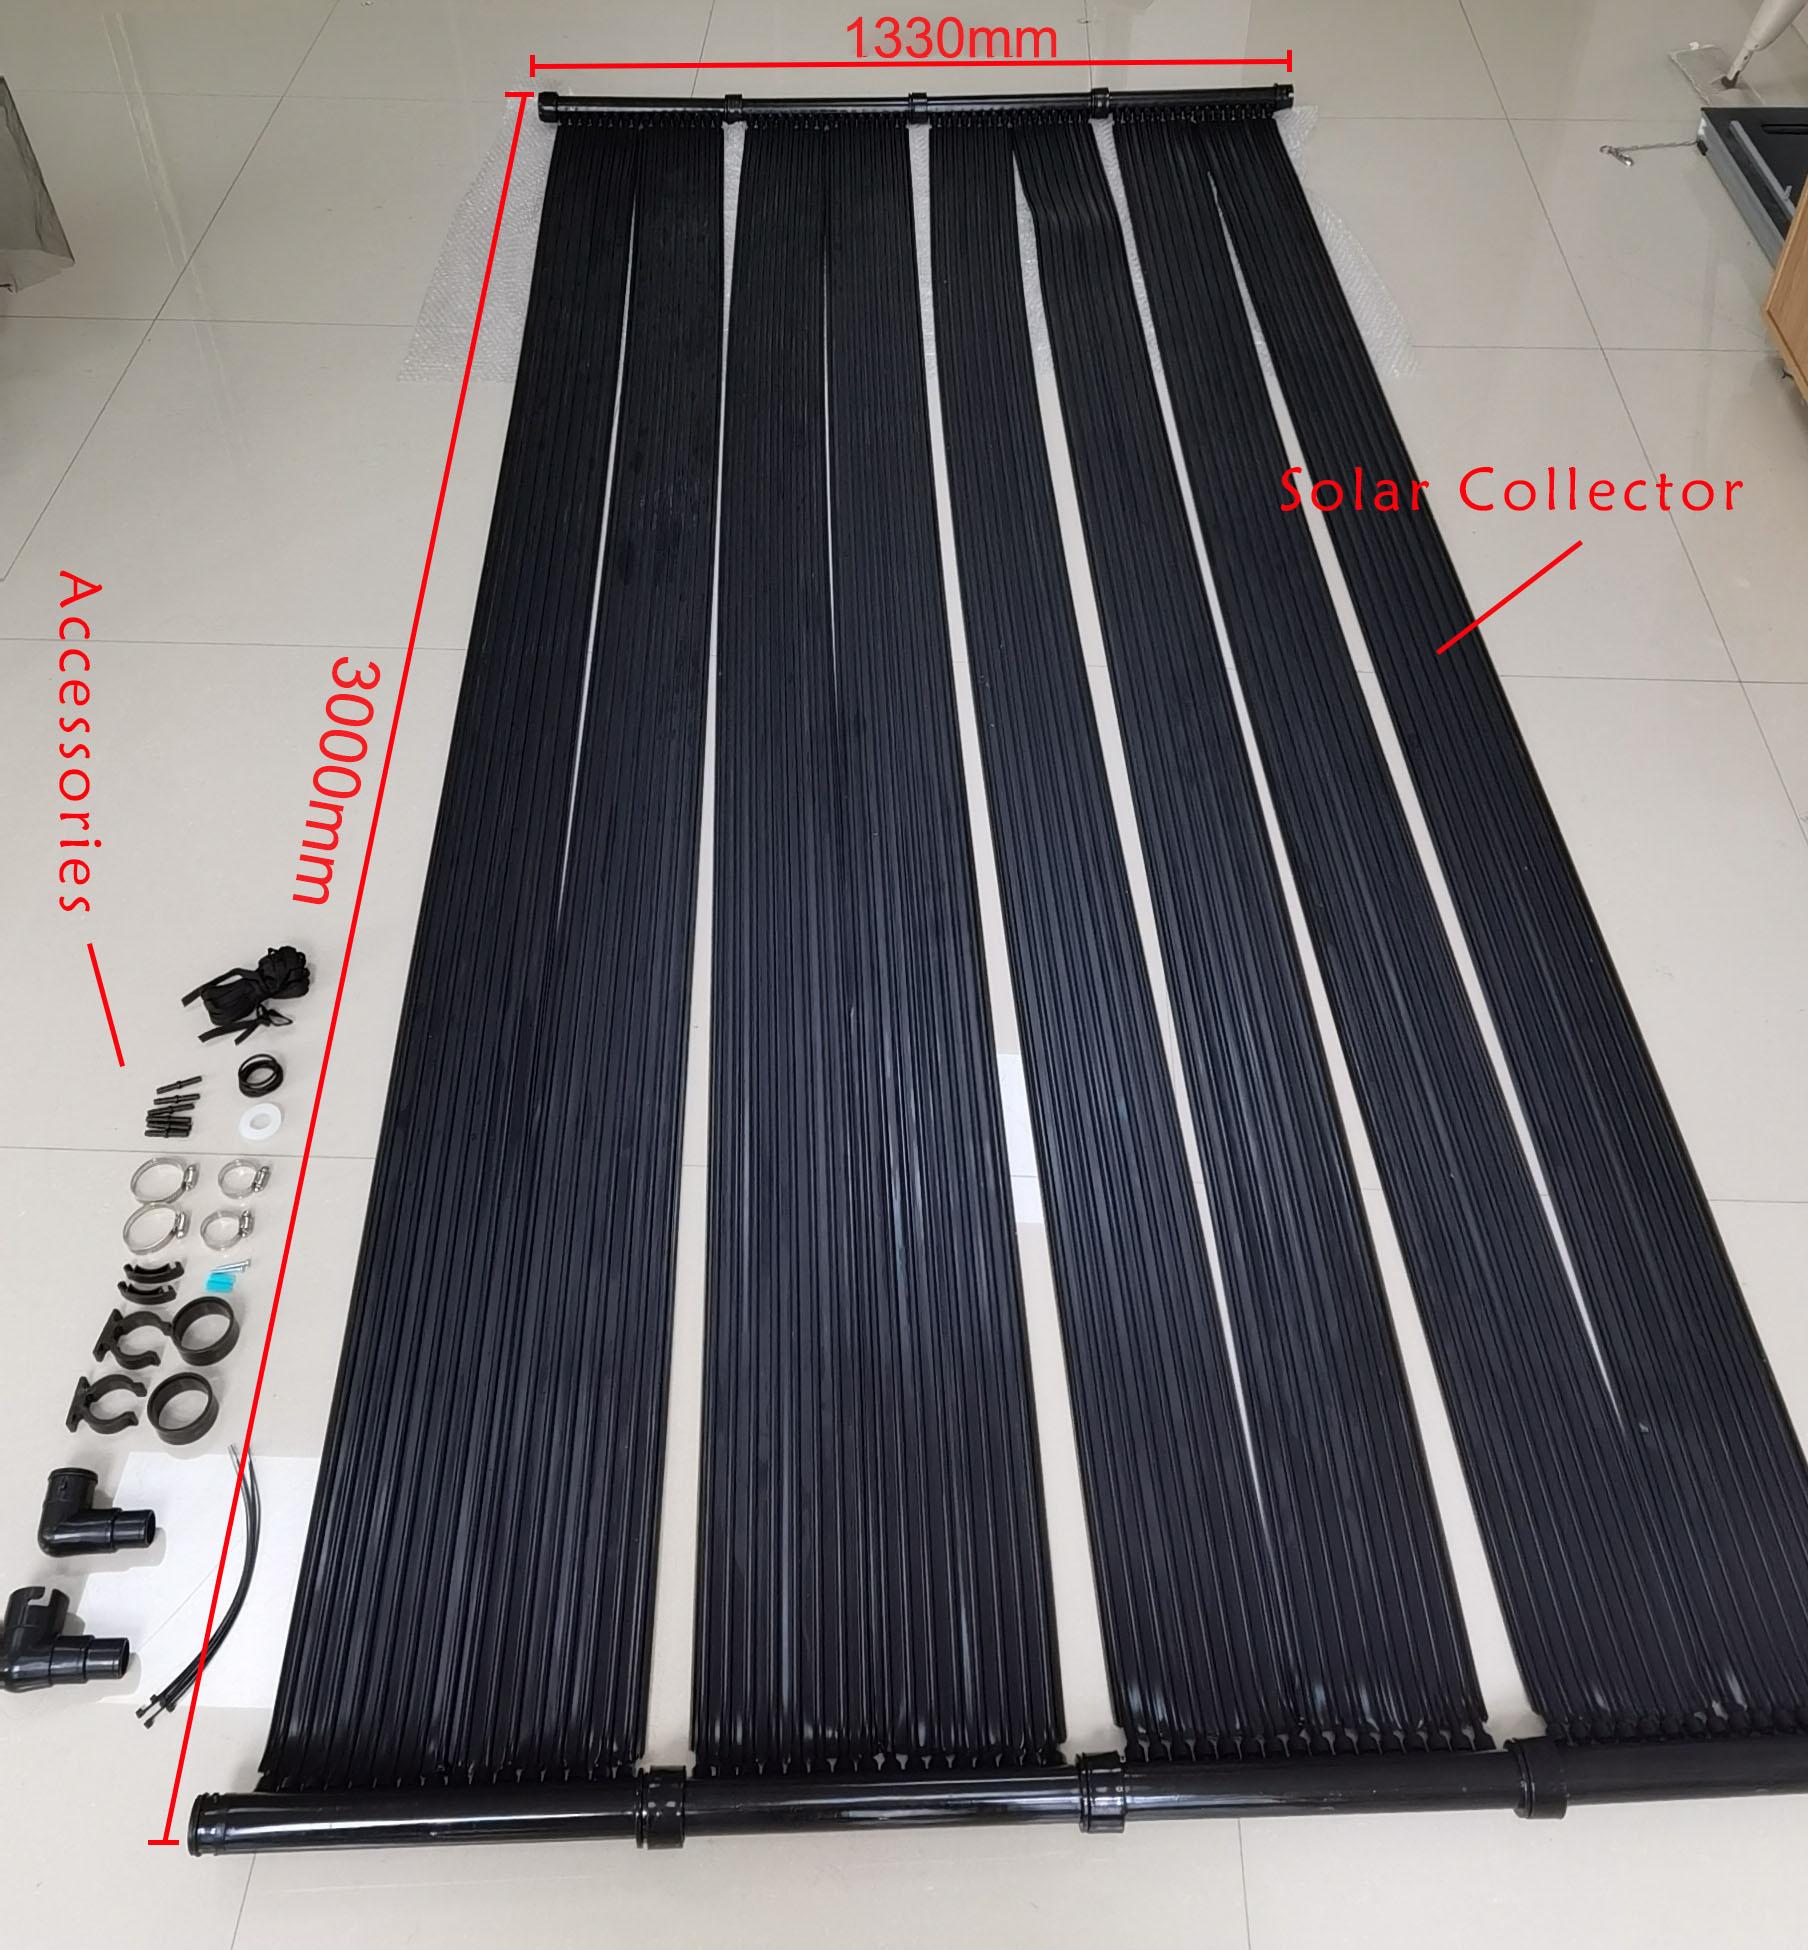 Uniepu EPDM Swimming Pool Solar Collector Heater